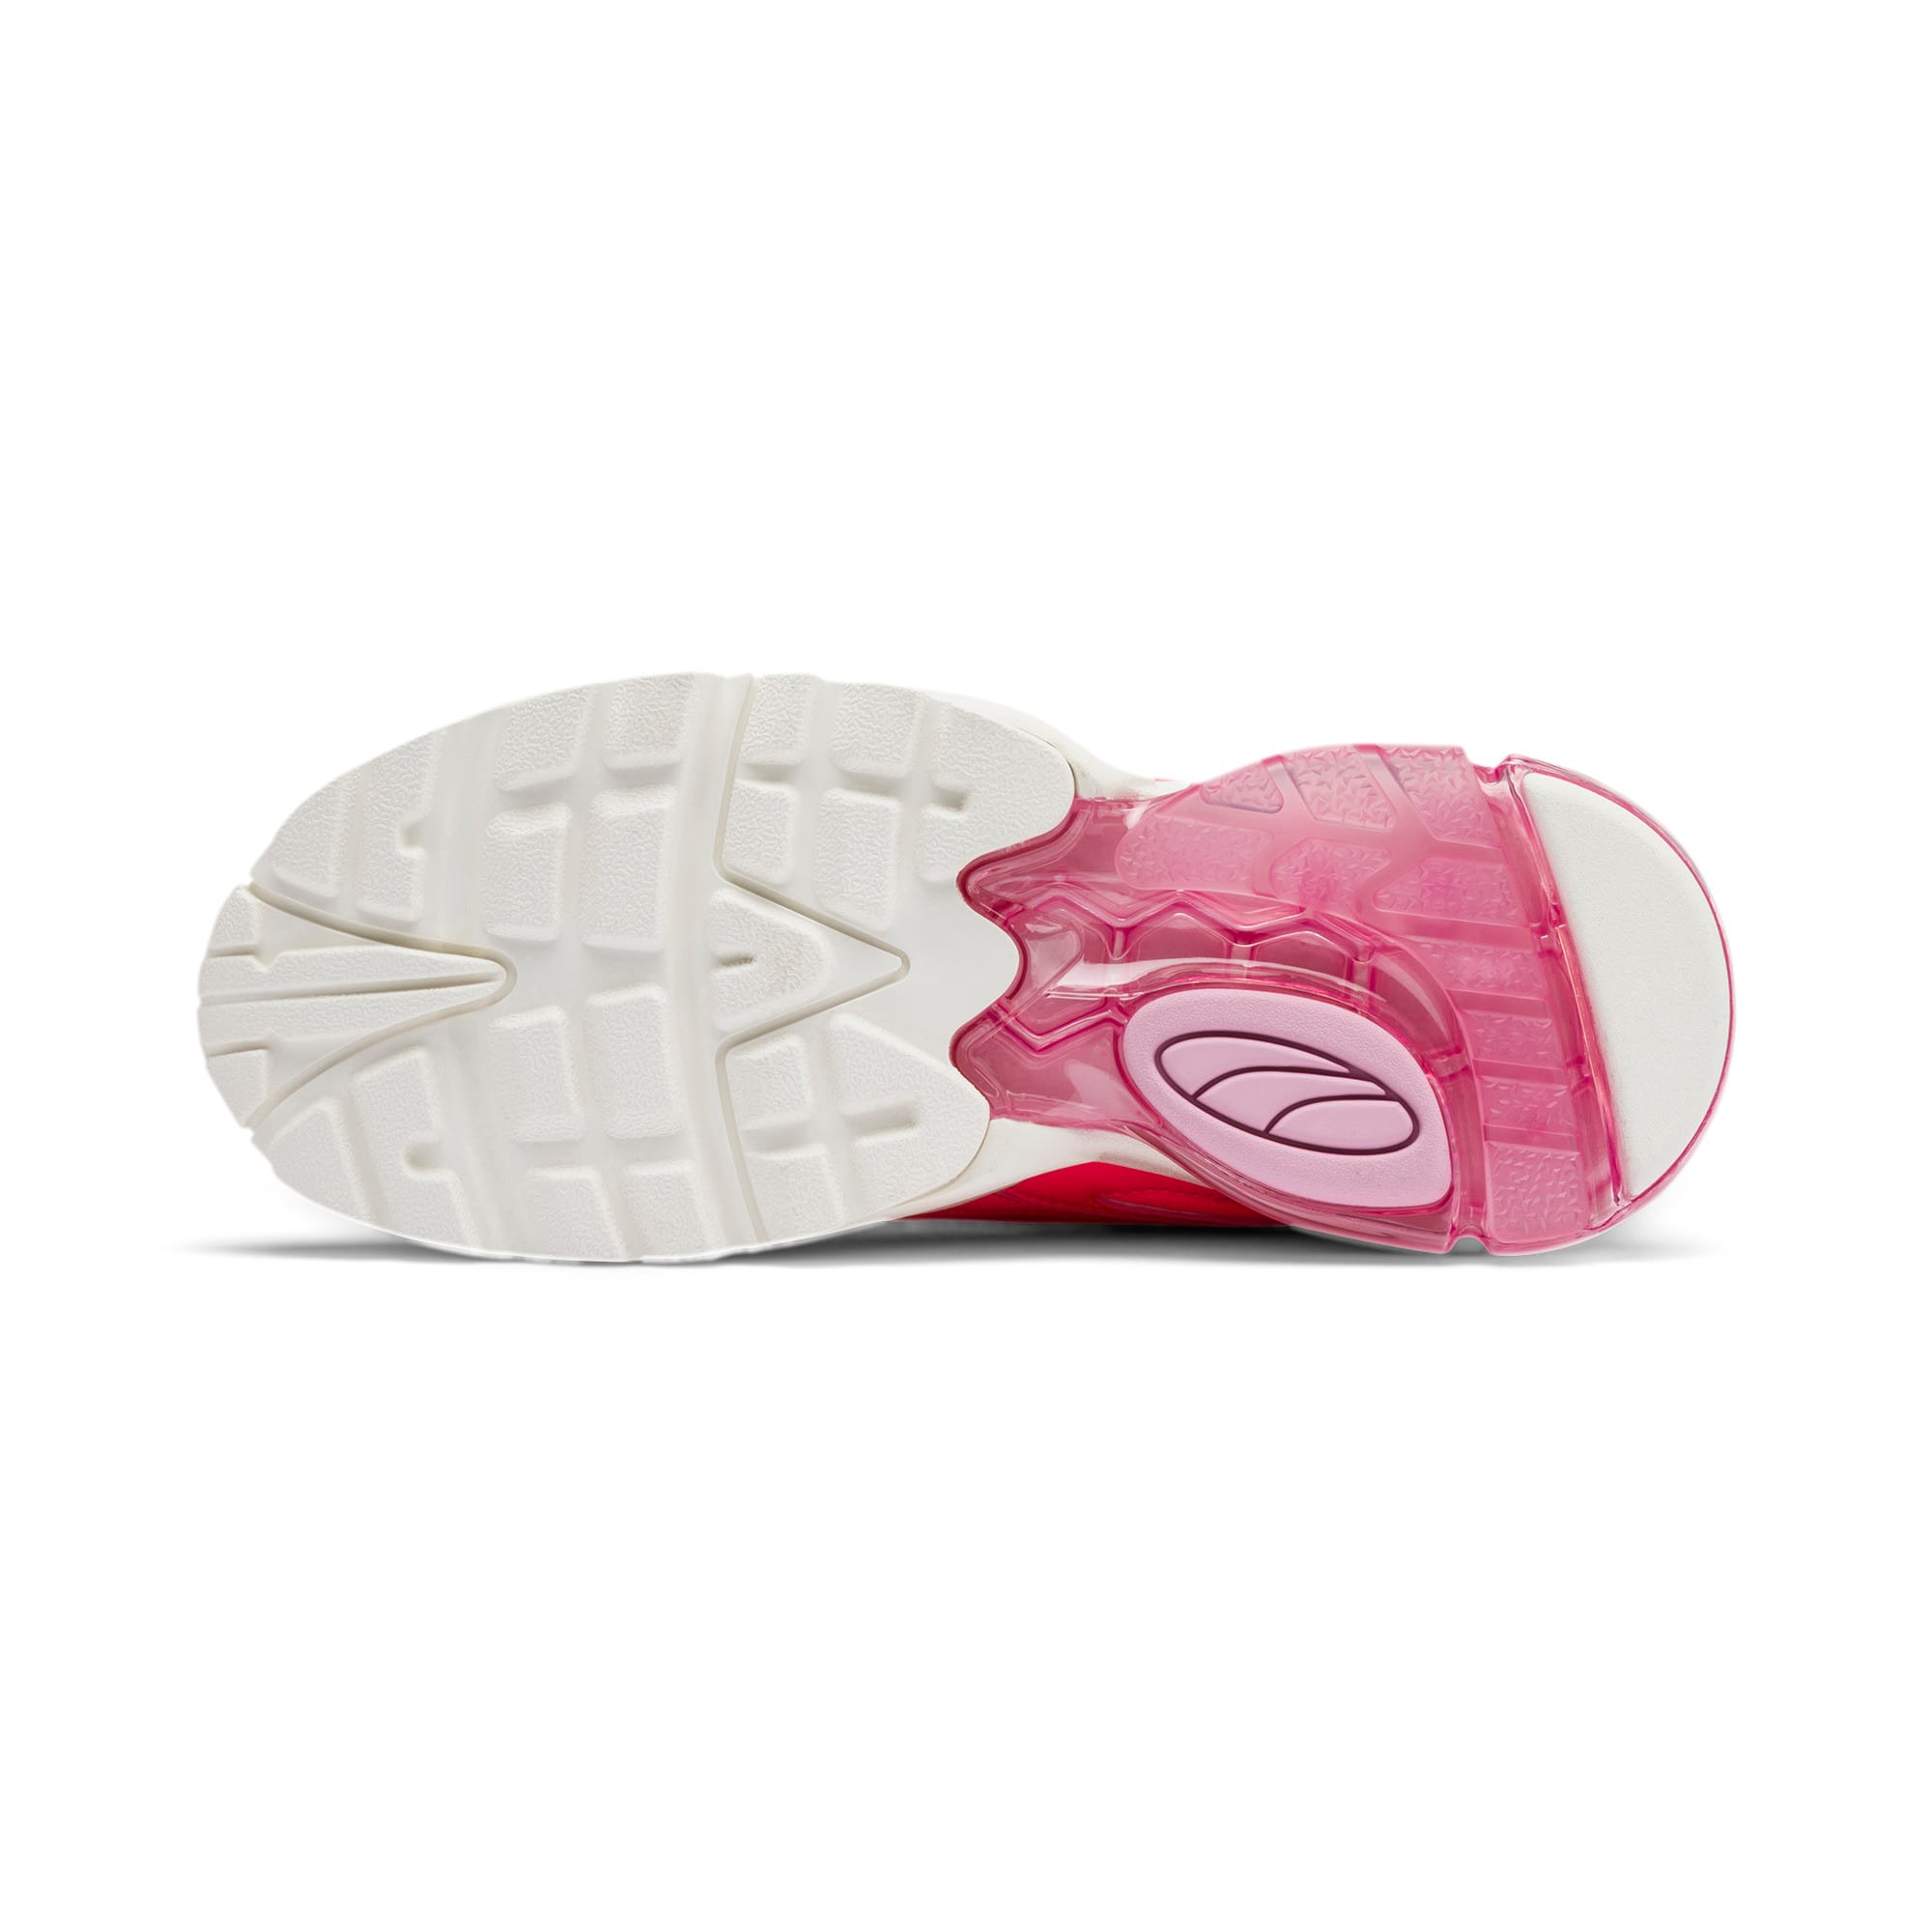 Thumbnail 5 of CELL Stellar Neon Women's Sneakers, Pink Alert-Heather, medium